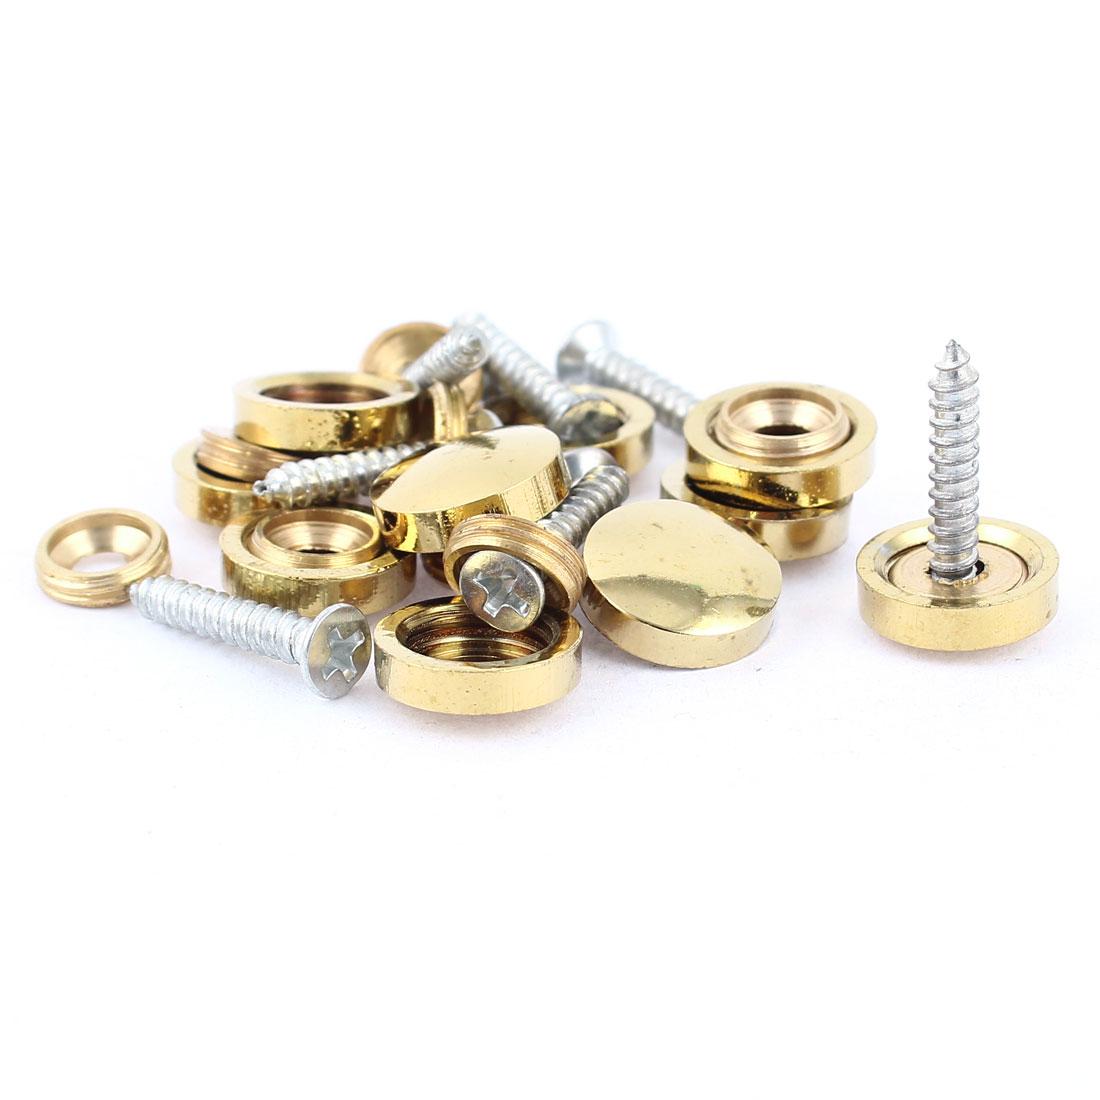 10 Pcs Fitting Parts Brass Tone 14mm Diameter Screw Cap Mirror Nails Decoration Lid